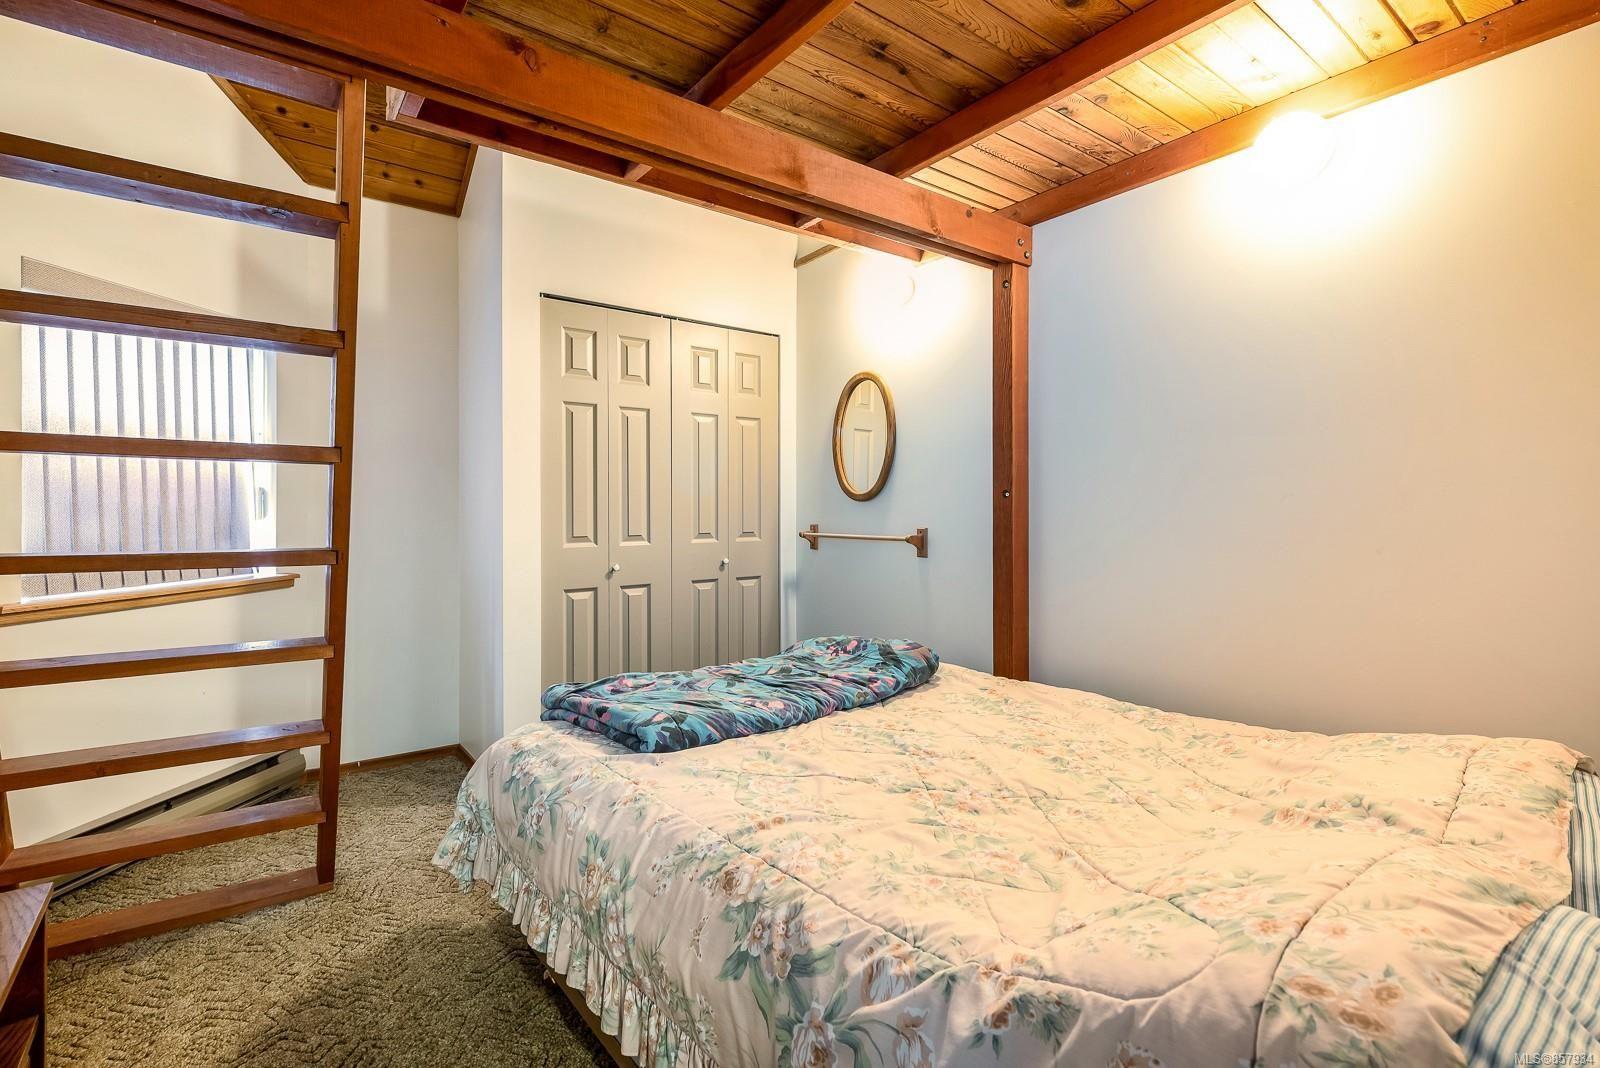 Photo 13: Photos: 998 STRATA Way in : CV Mt Washington House for sale (Comox Valley)  : MLS®# 857934